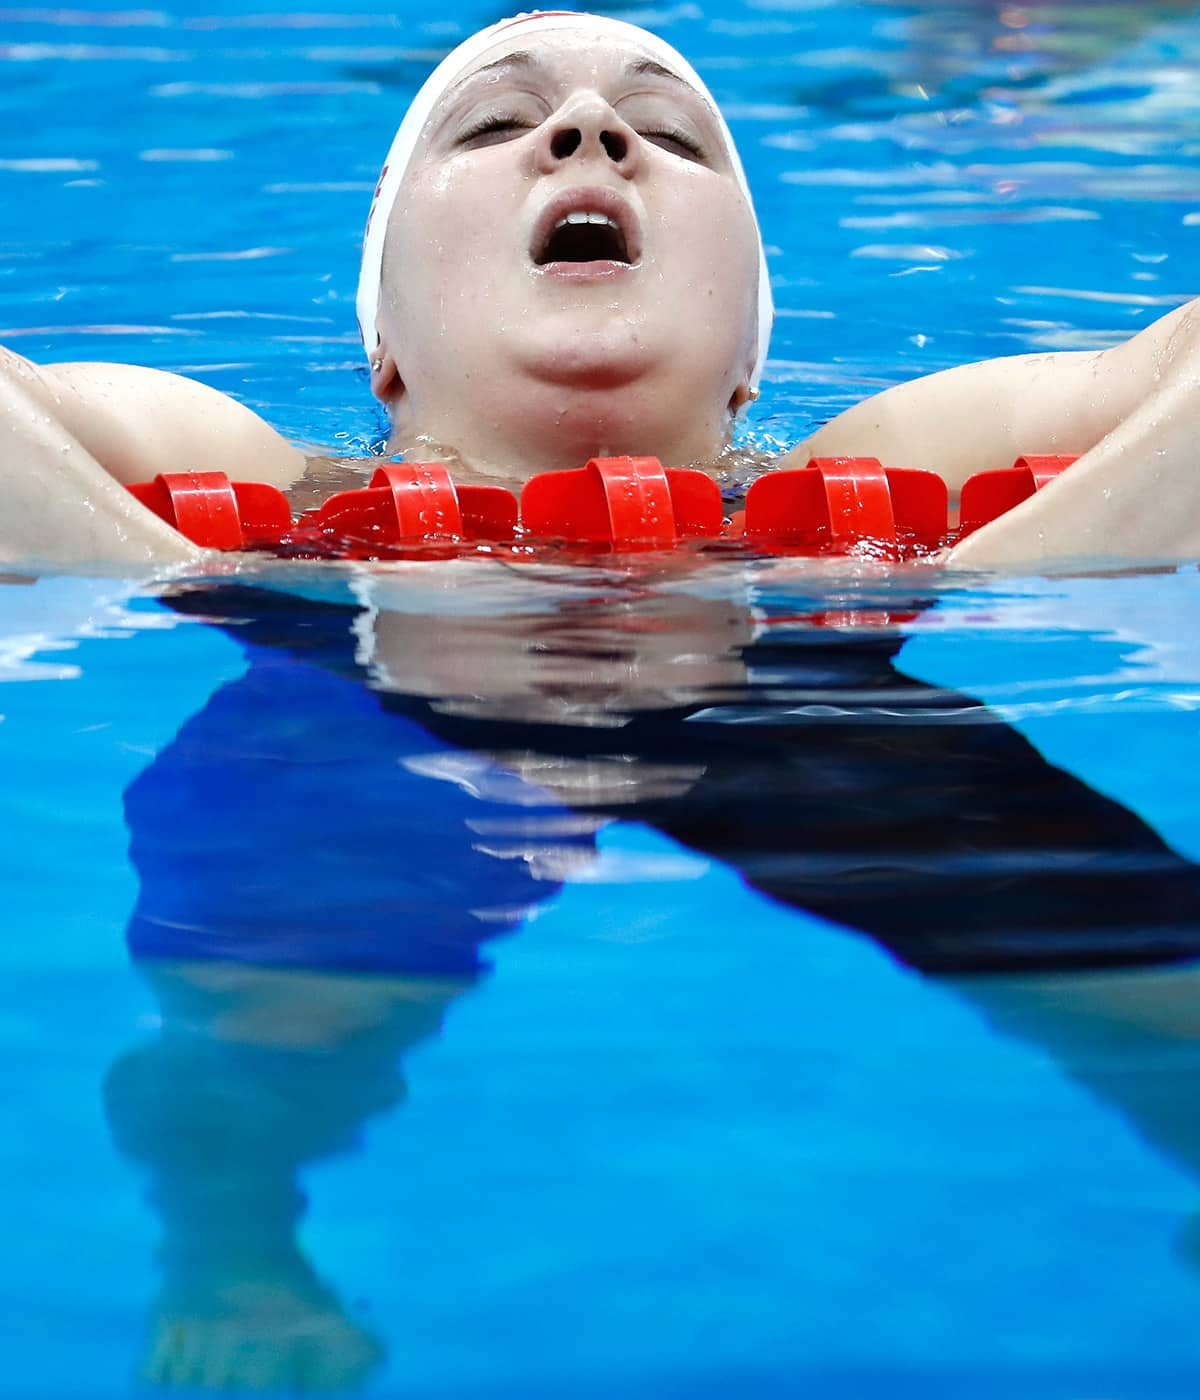 Brittany MacLean: My Olympic dream came true yet I still felt worthless